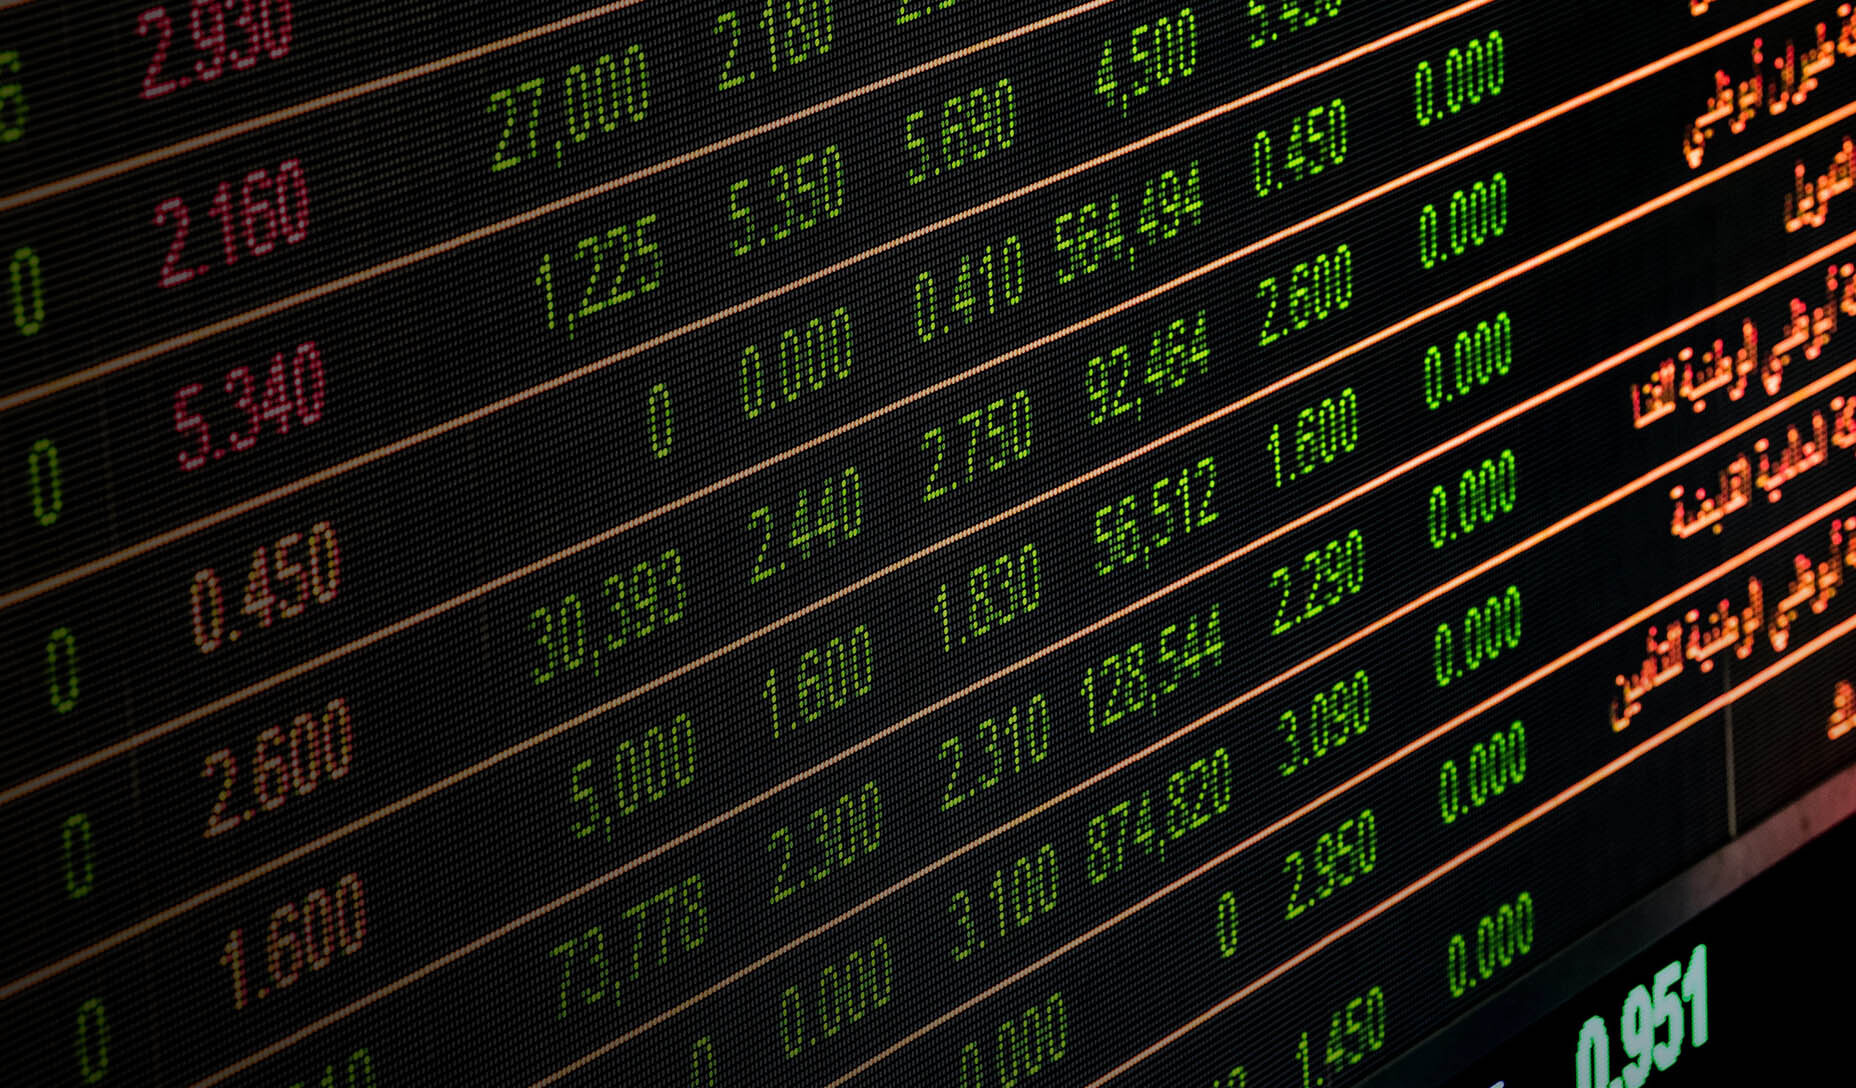 Crowdfunding Investment Ticker